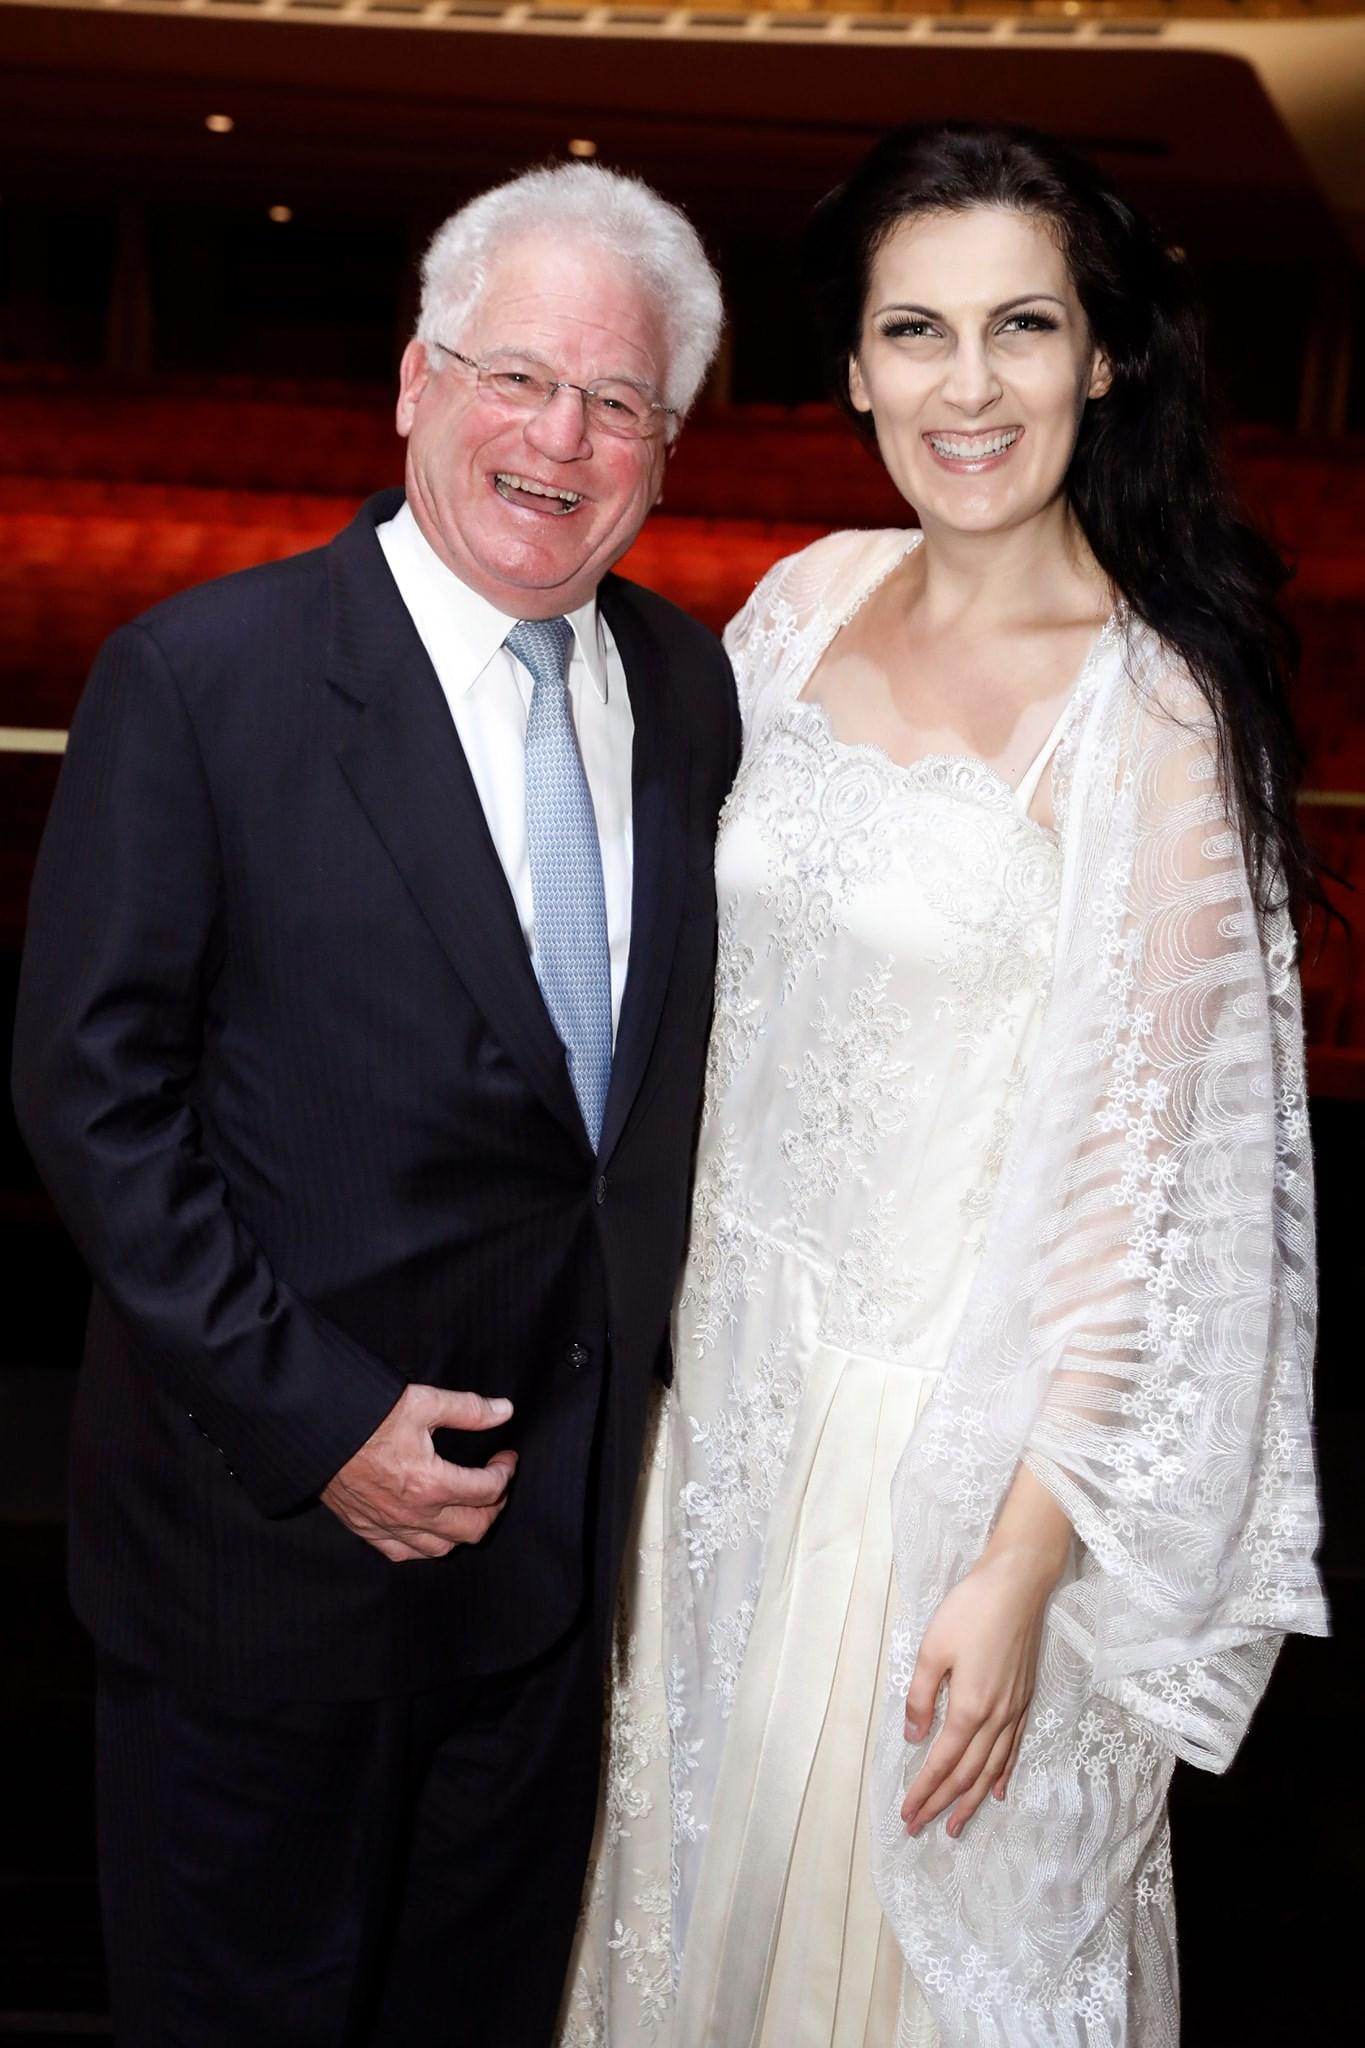 Mr. Marc Stern, Chairman of LA Opera Board / Президент Лос-Анжелесской оперы Марк Стерн